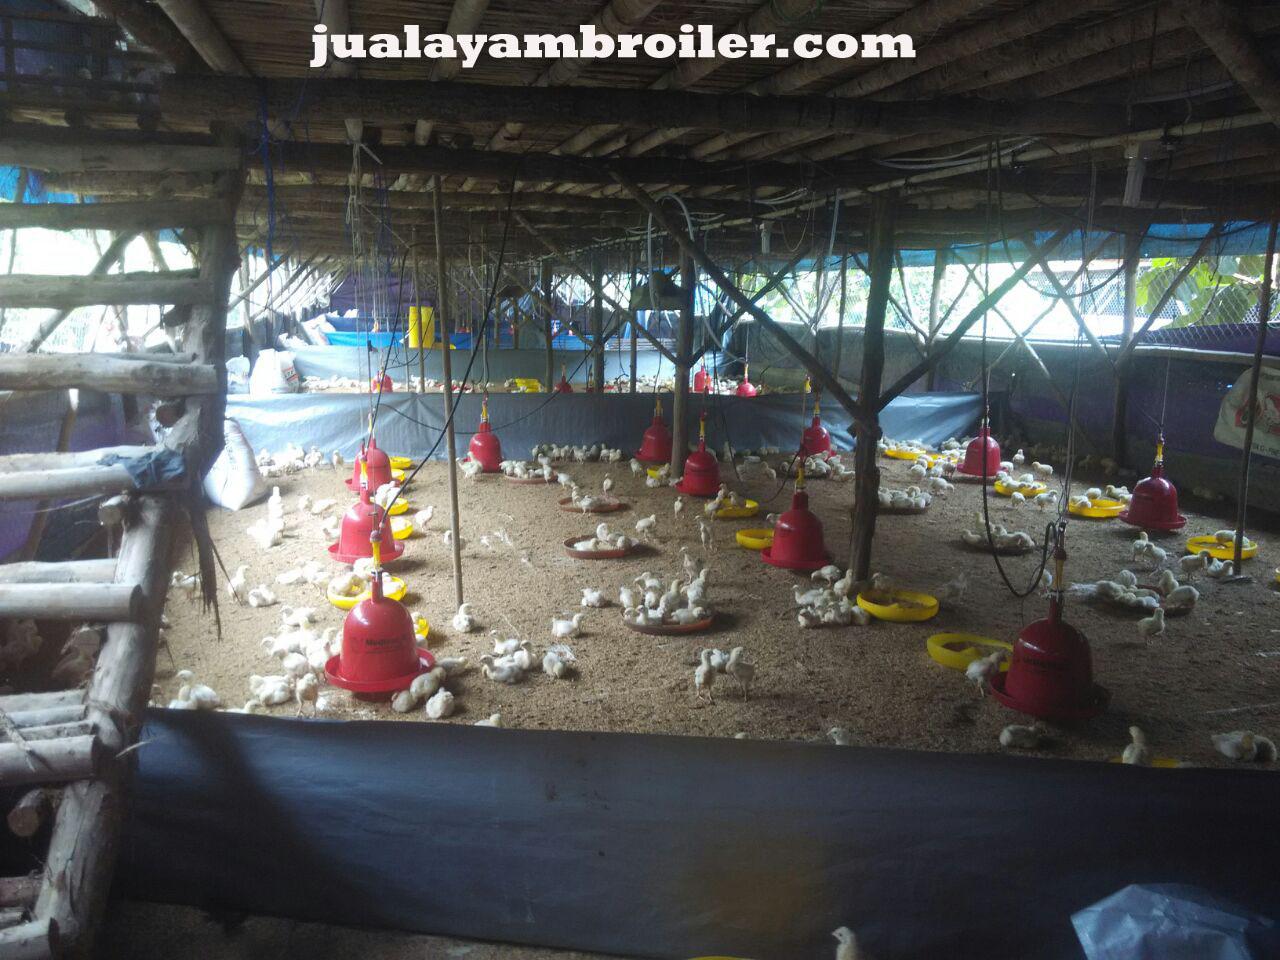 Jual Ayam Broiler Jakarta Barat